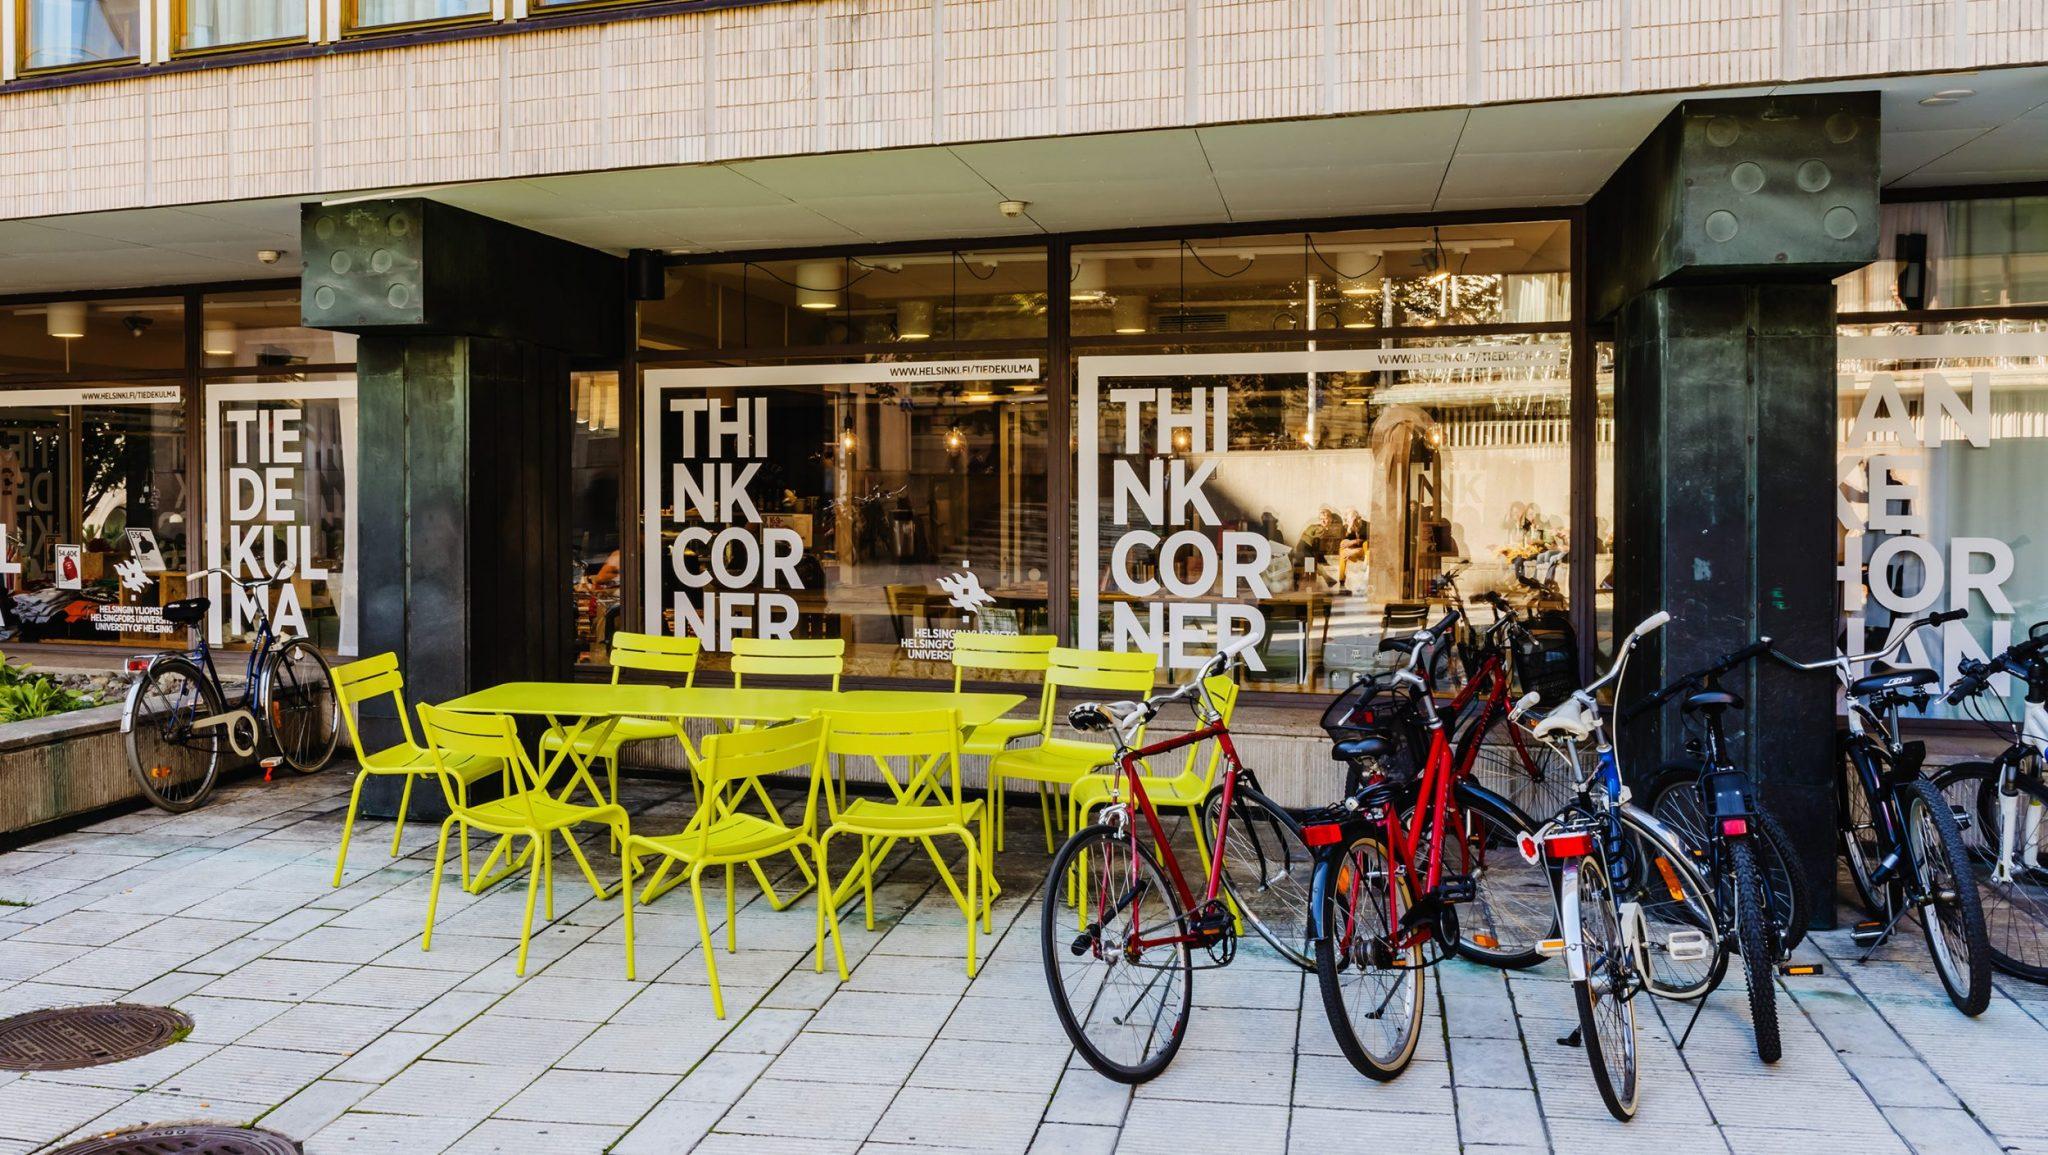 Think-Corner-pop-up-store-Aleksanterinkatu-Helsinki-GI-Project-7